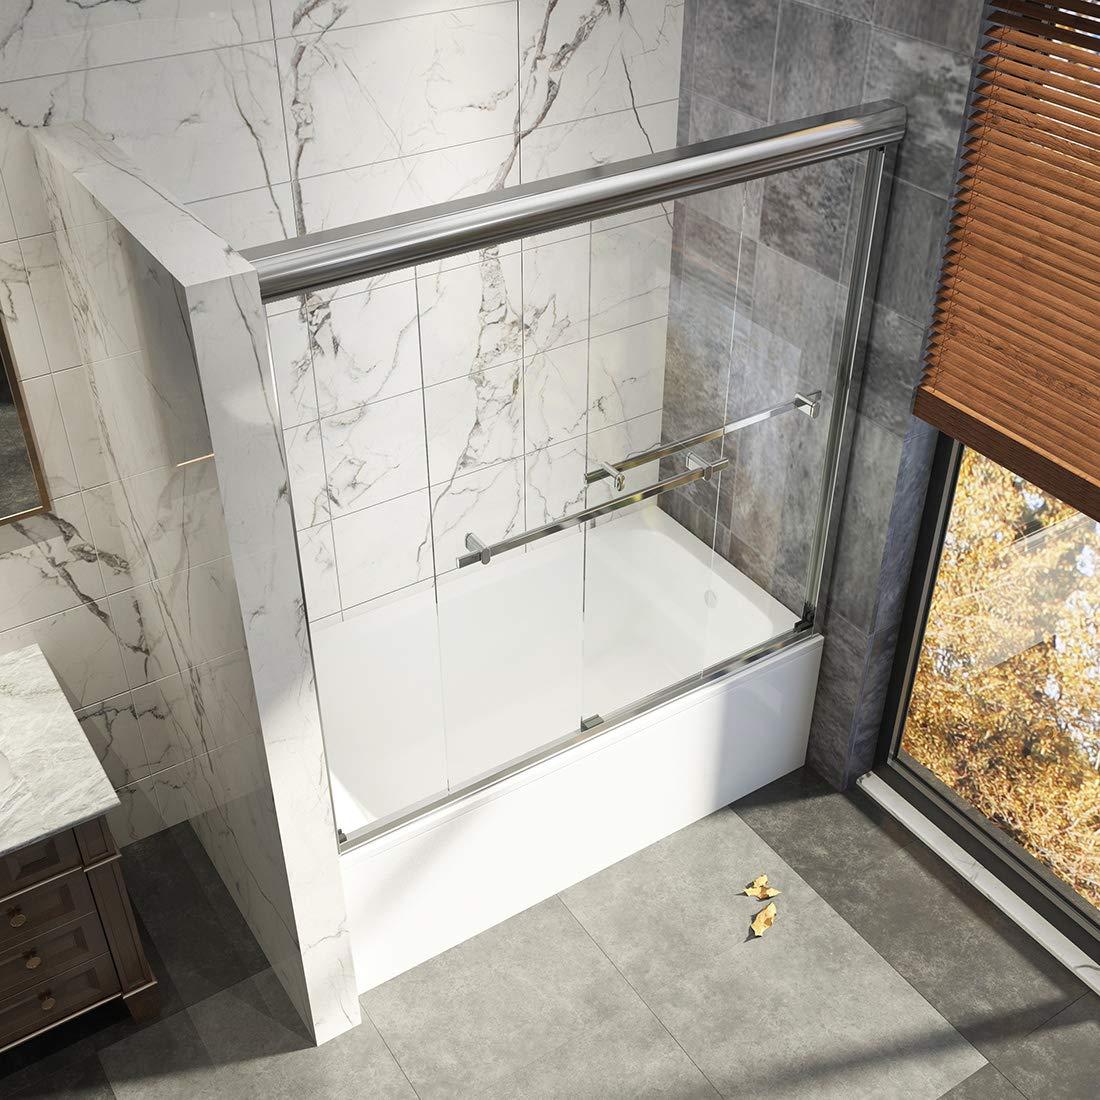 Duschdeluxe 36x55 Bathtub Shower Door 1//4 Clear Tempered Glass Hinged Pivot Framless Stationary Panel Bathtub Screen Chrome Finish